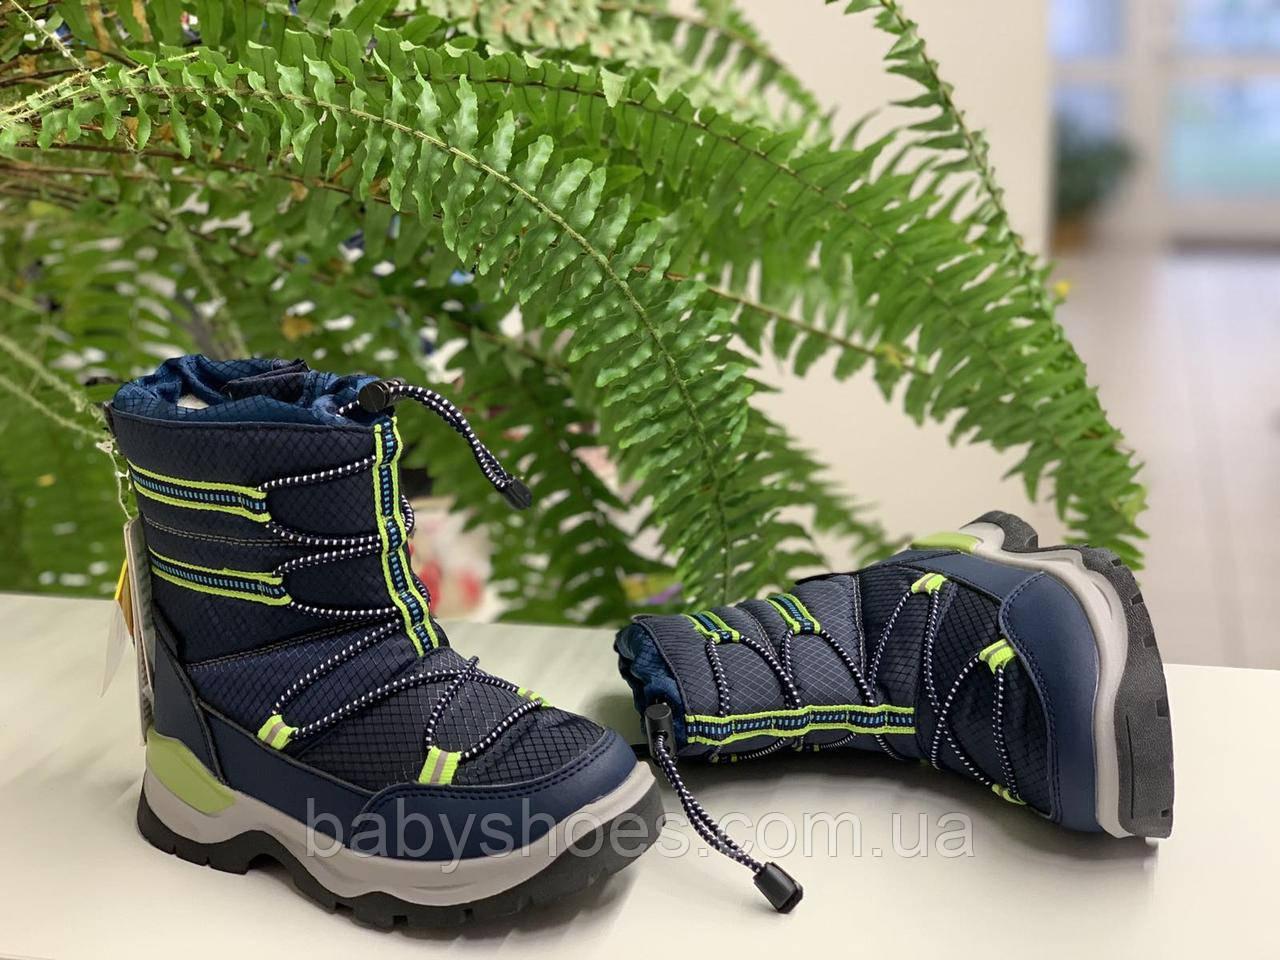 Зимние термо-ботинки для мальчика Tom.m  р.27-32, ЗМ-216